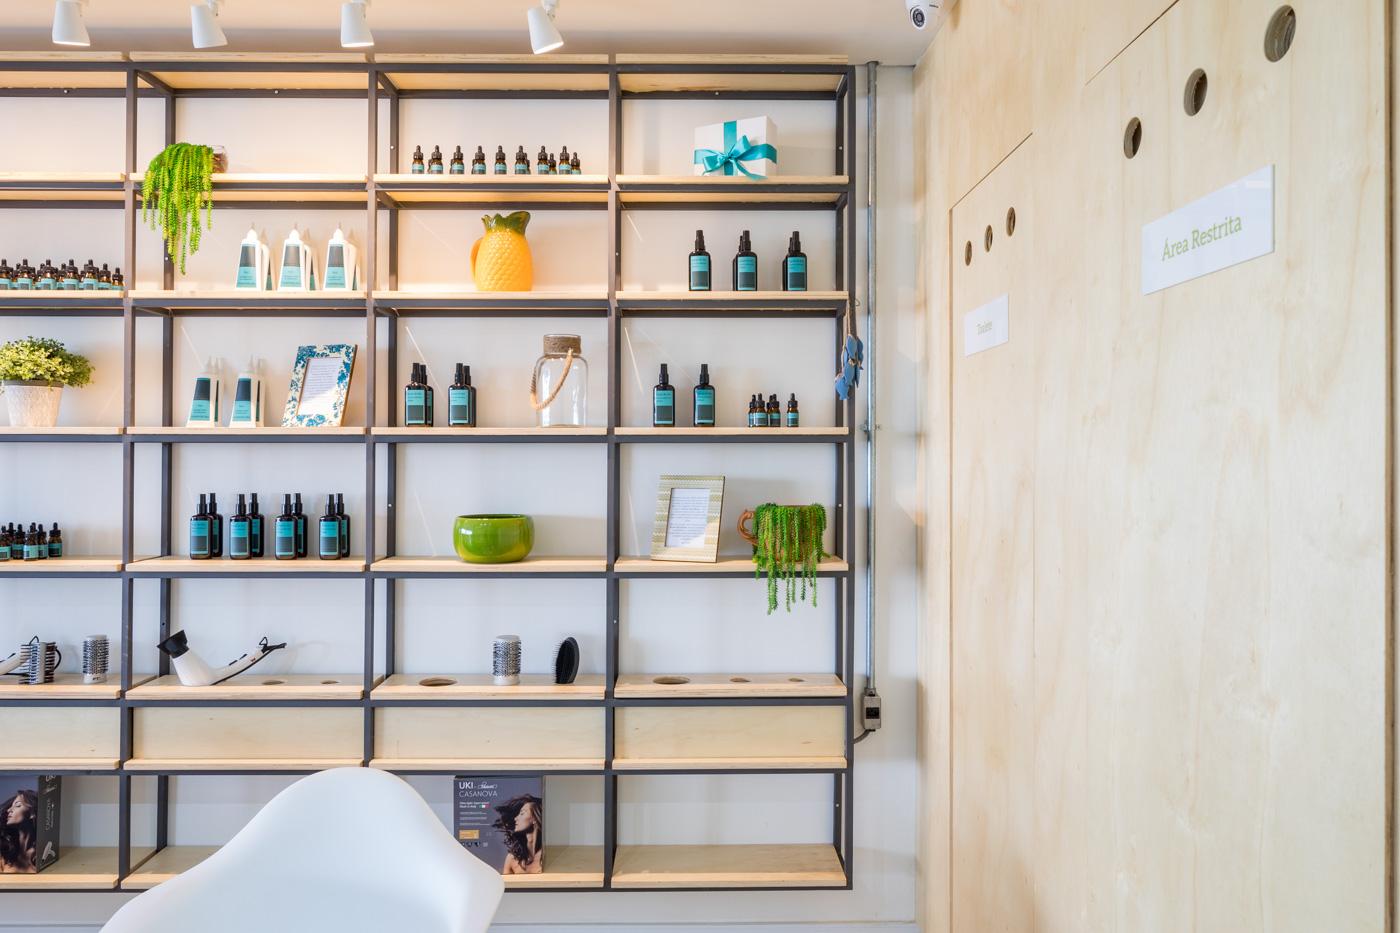 Estúdio-Mova-arquitetura-interiores-comercial-foto-haruo-mikami_137_Baixa.jpg